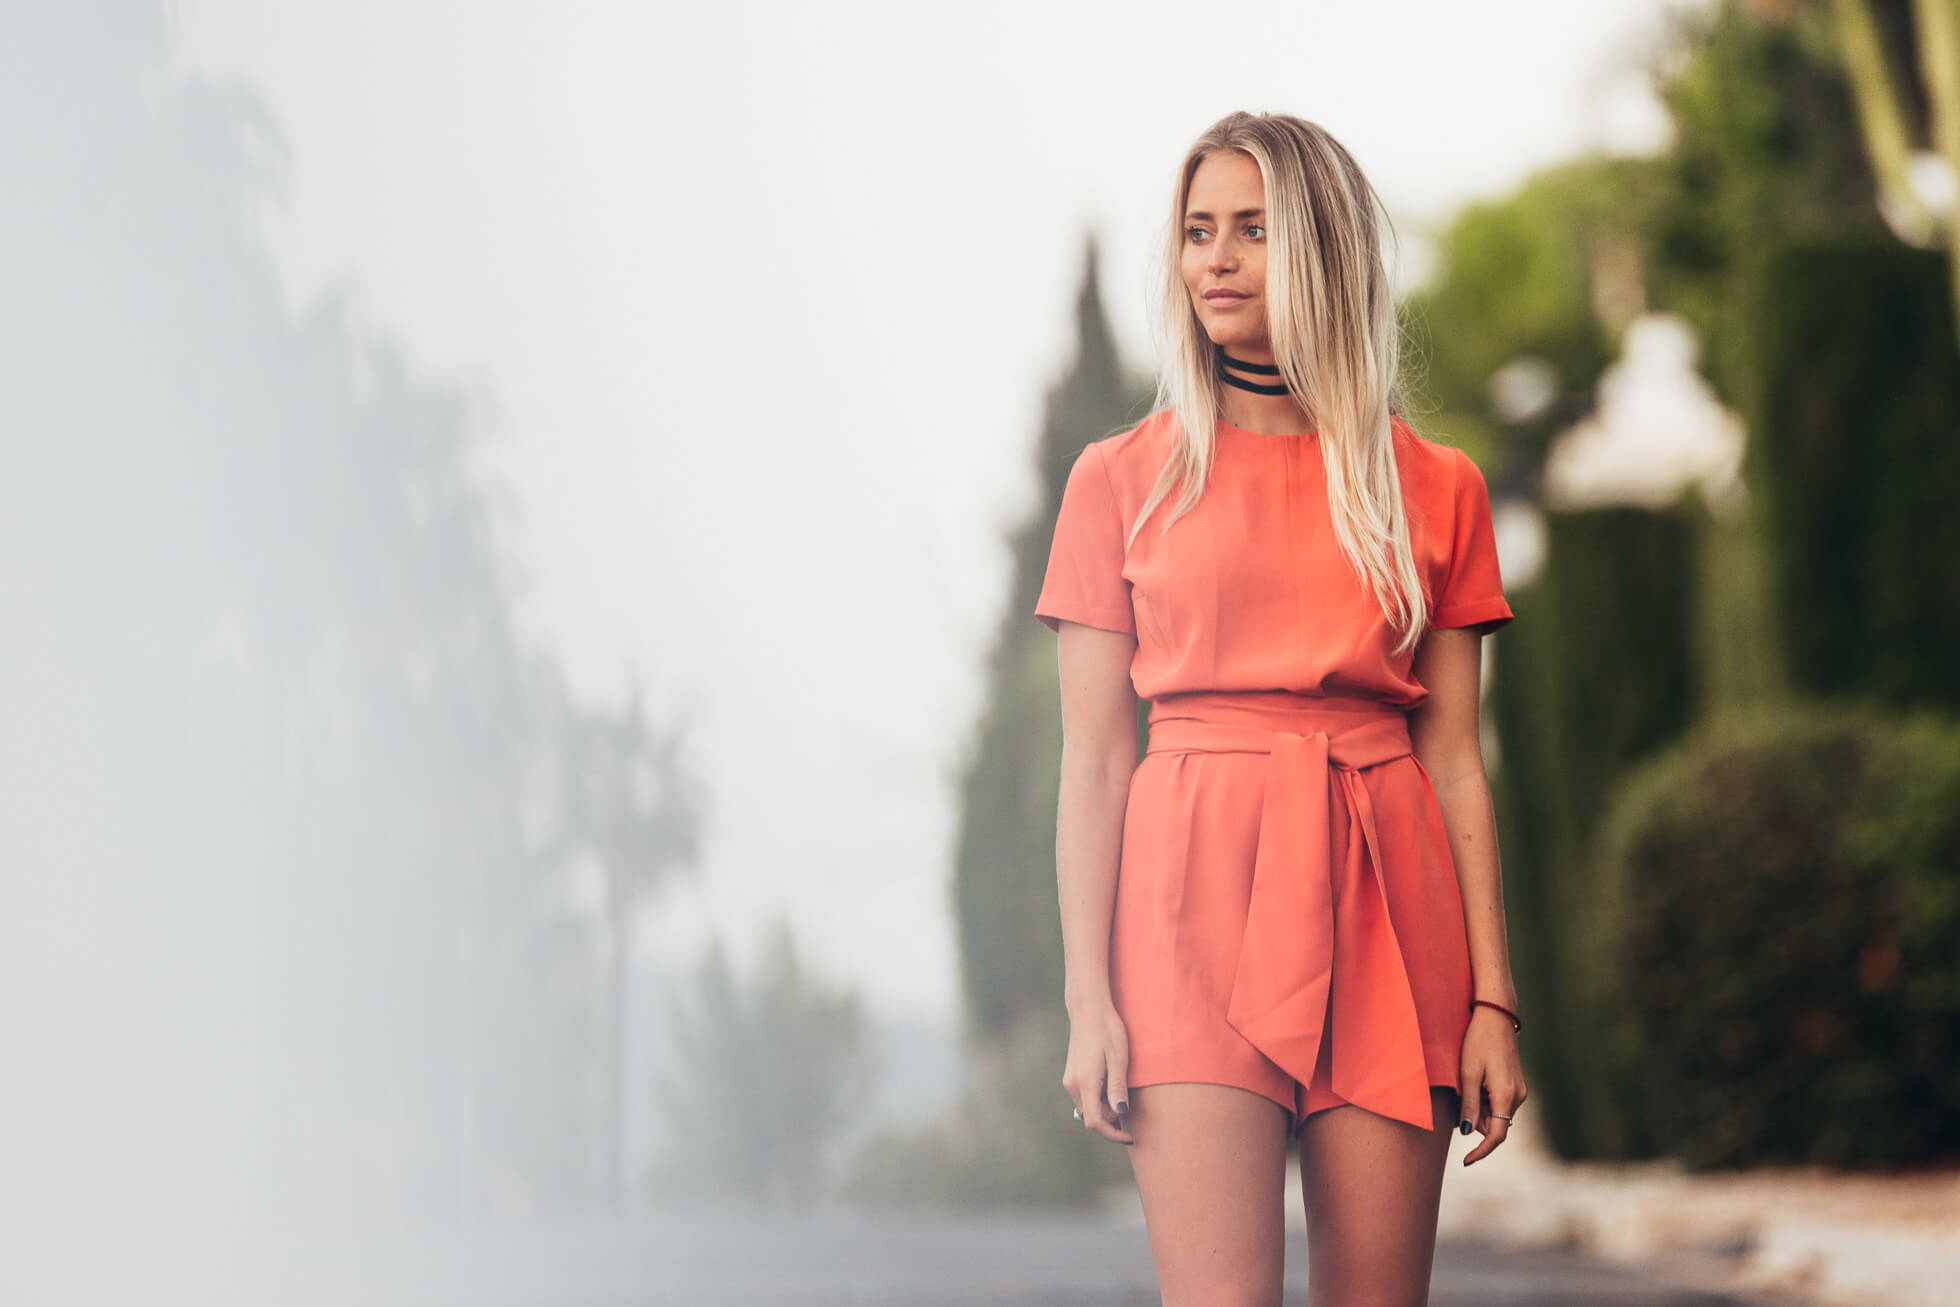 janni-deler-bright-orangej1280502